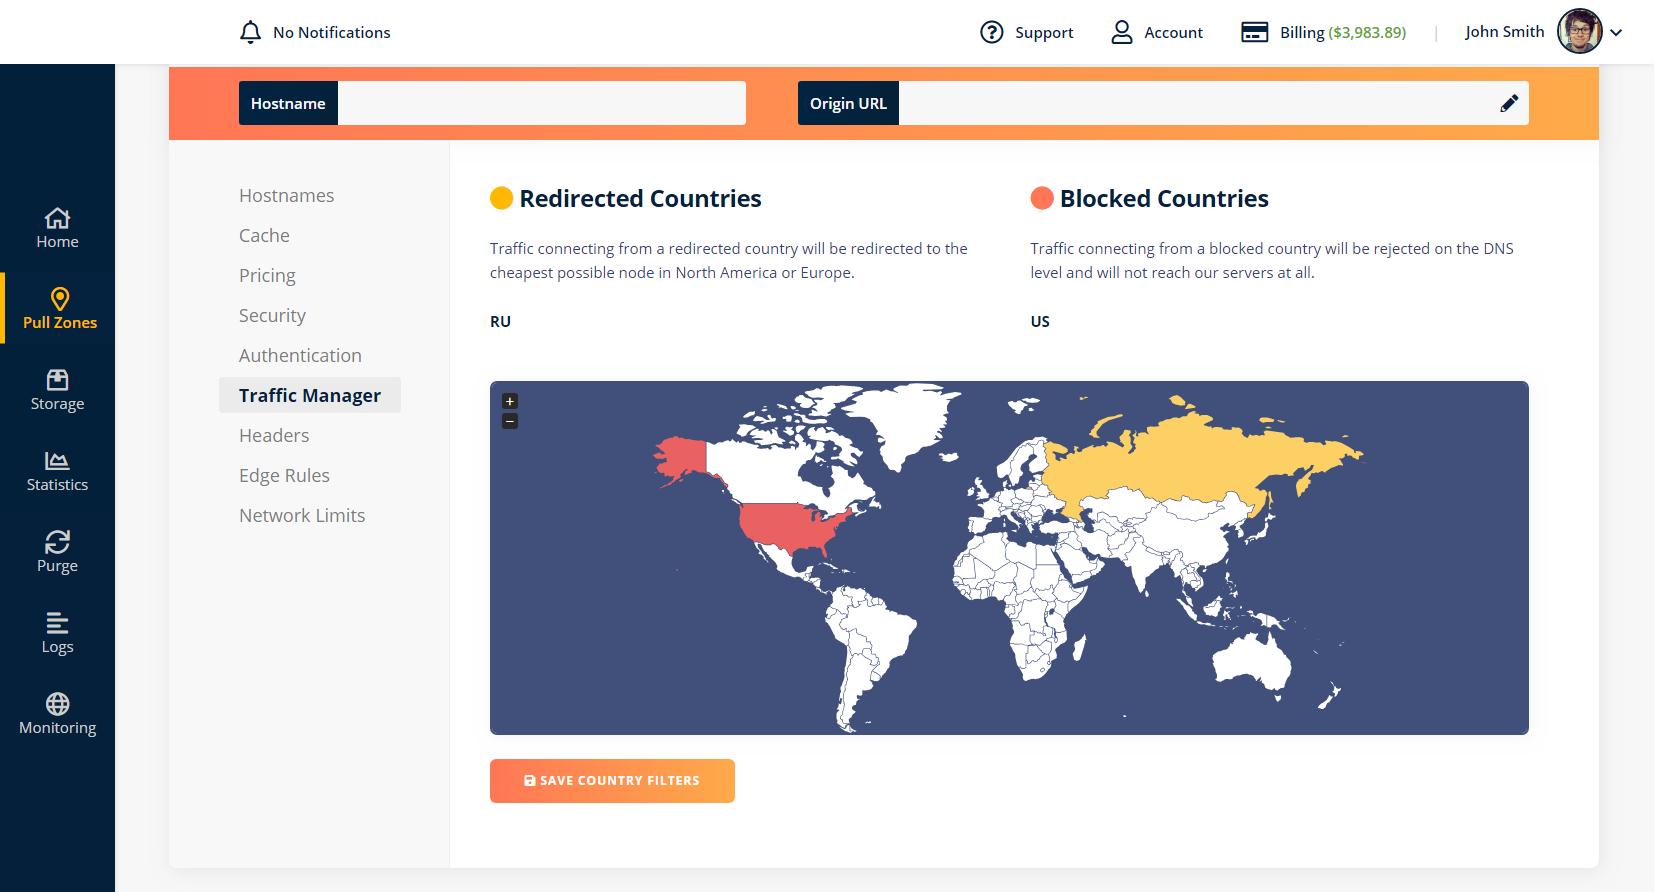 Security Features Screenshot